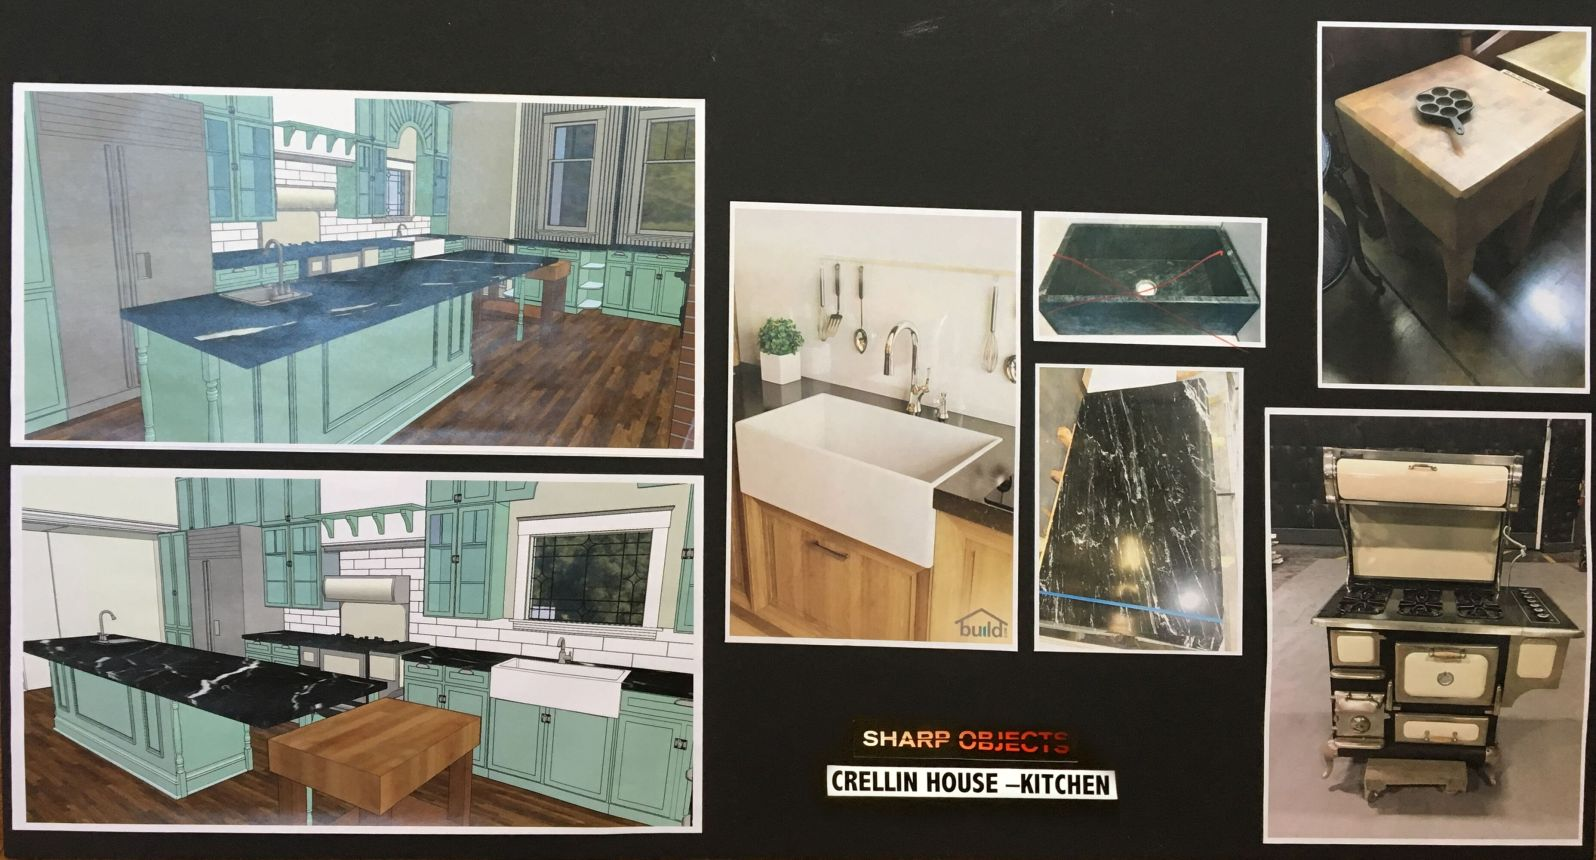 Sharp Objects | Crellin House Moodboard | HBO